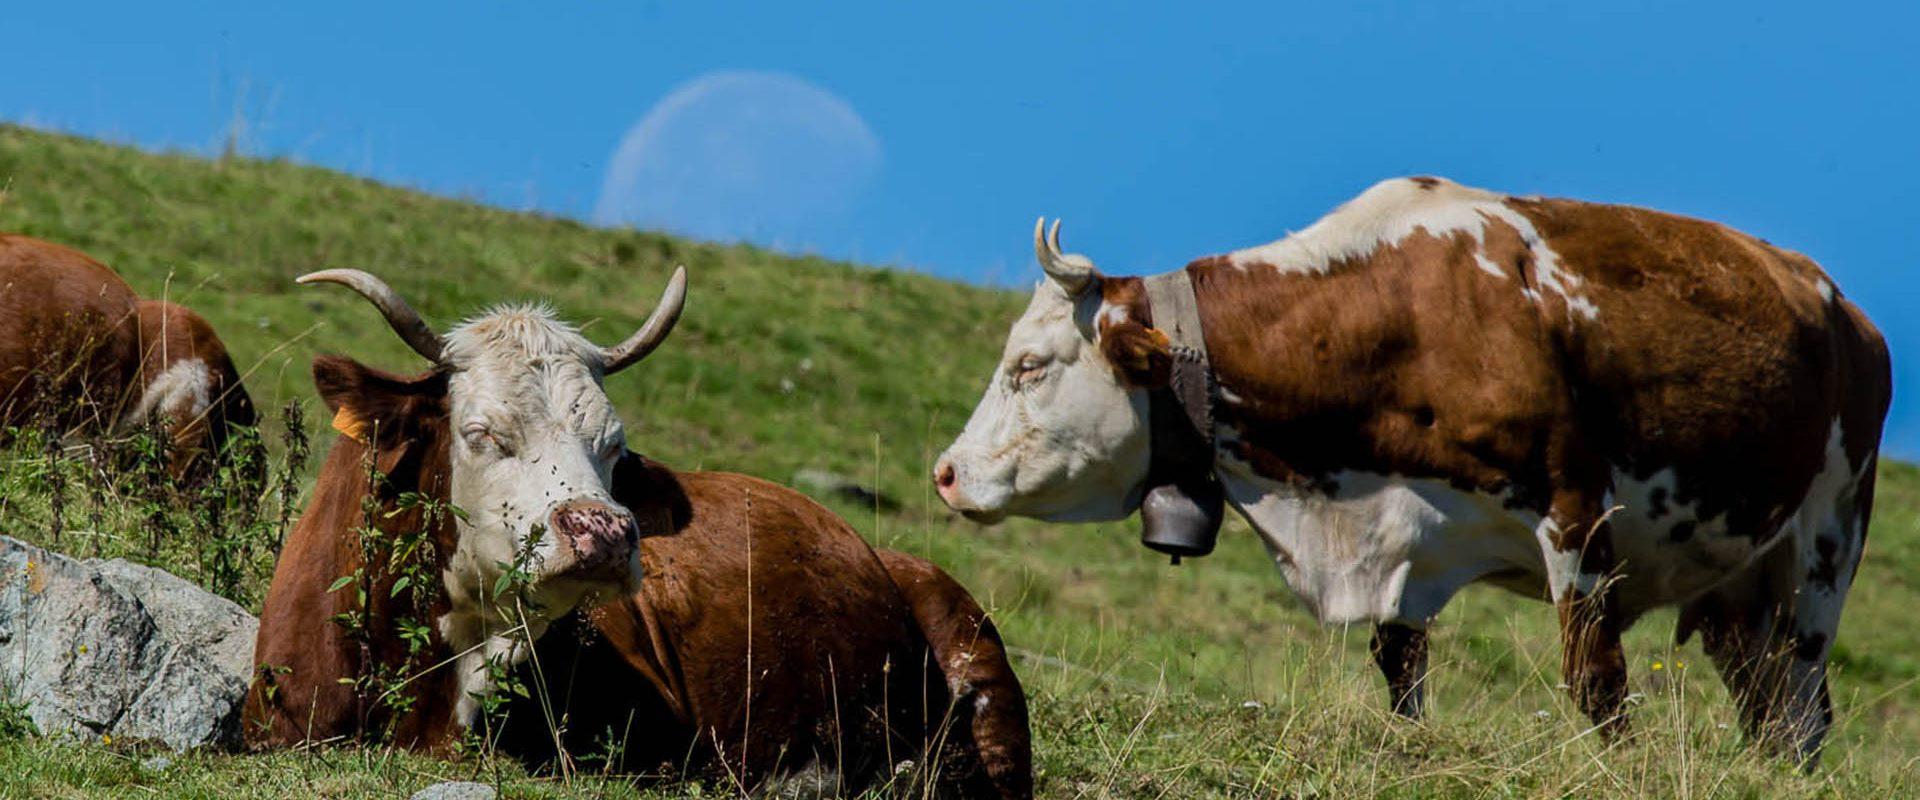 mucche-con-luna-calante-3-agriturismo-alpemoncerchio